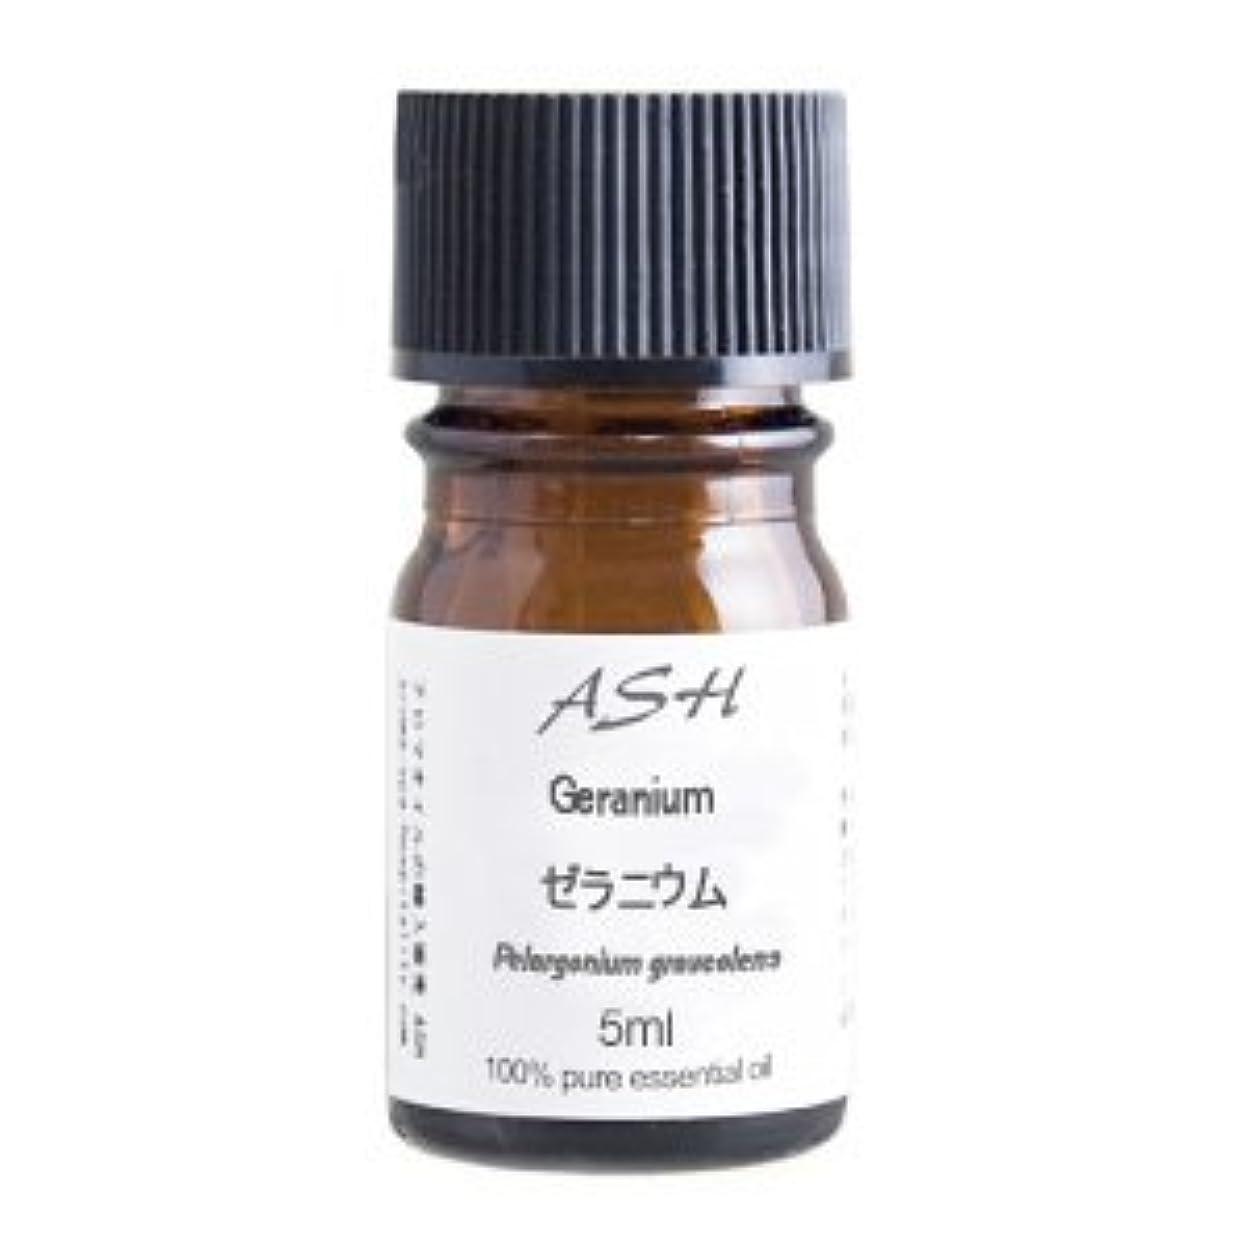 ASH ゼラニウム エッセンシャルオイル 5ml AEAJ表示基準適合認定精油